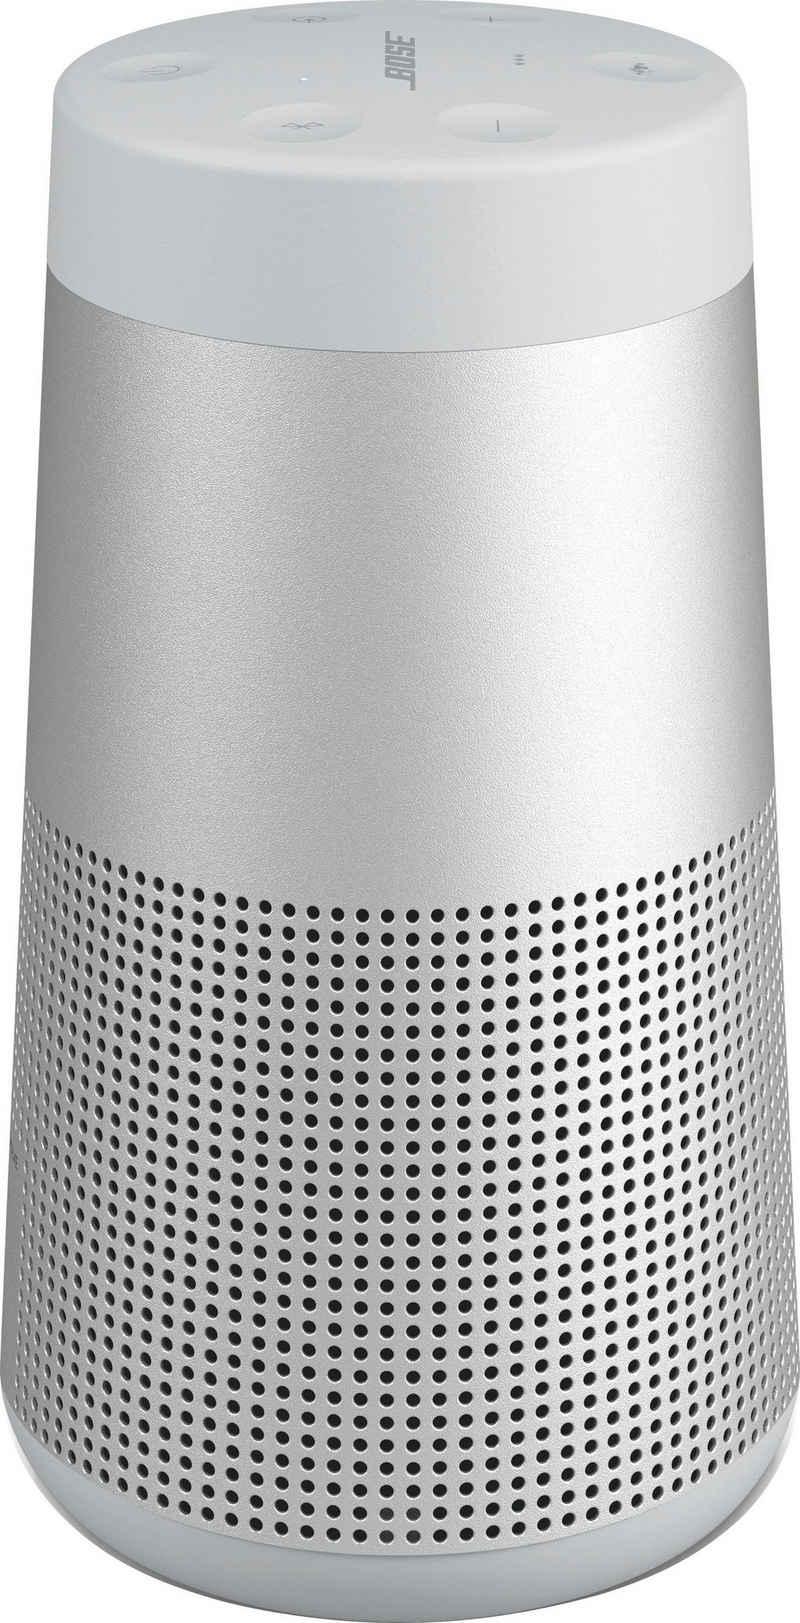 Bose SoundLink Revolve II Stereo Bluetooth-Lautsprecher (Bluetooth)